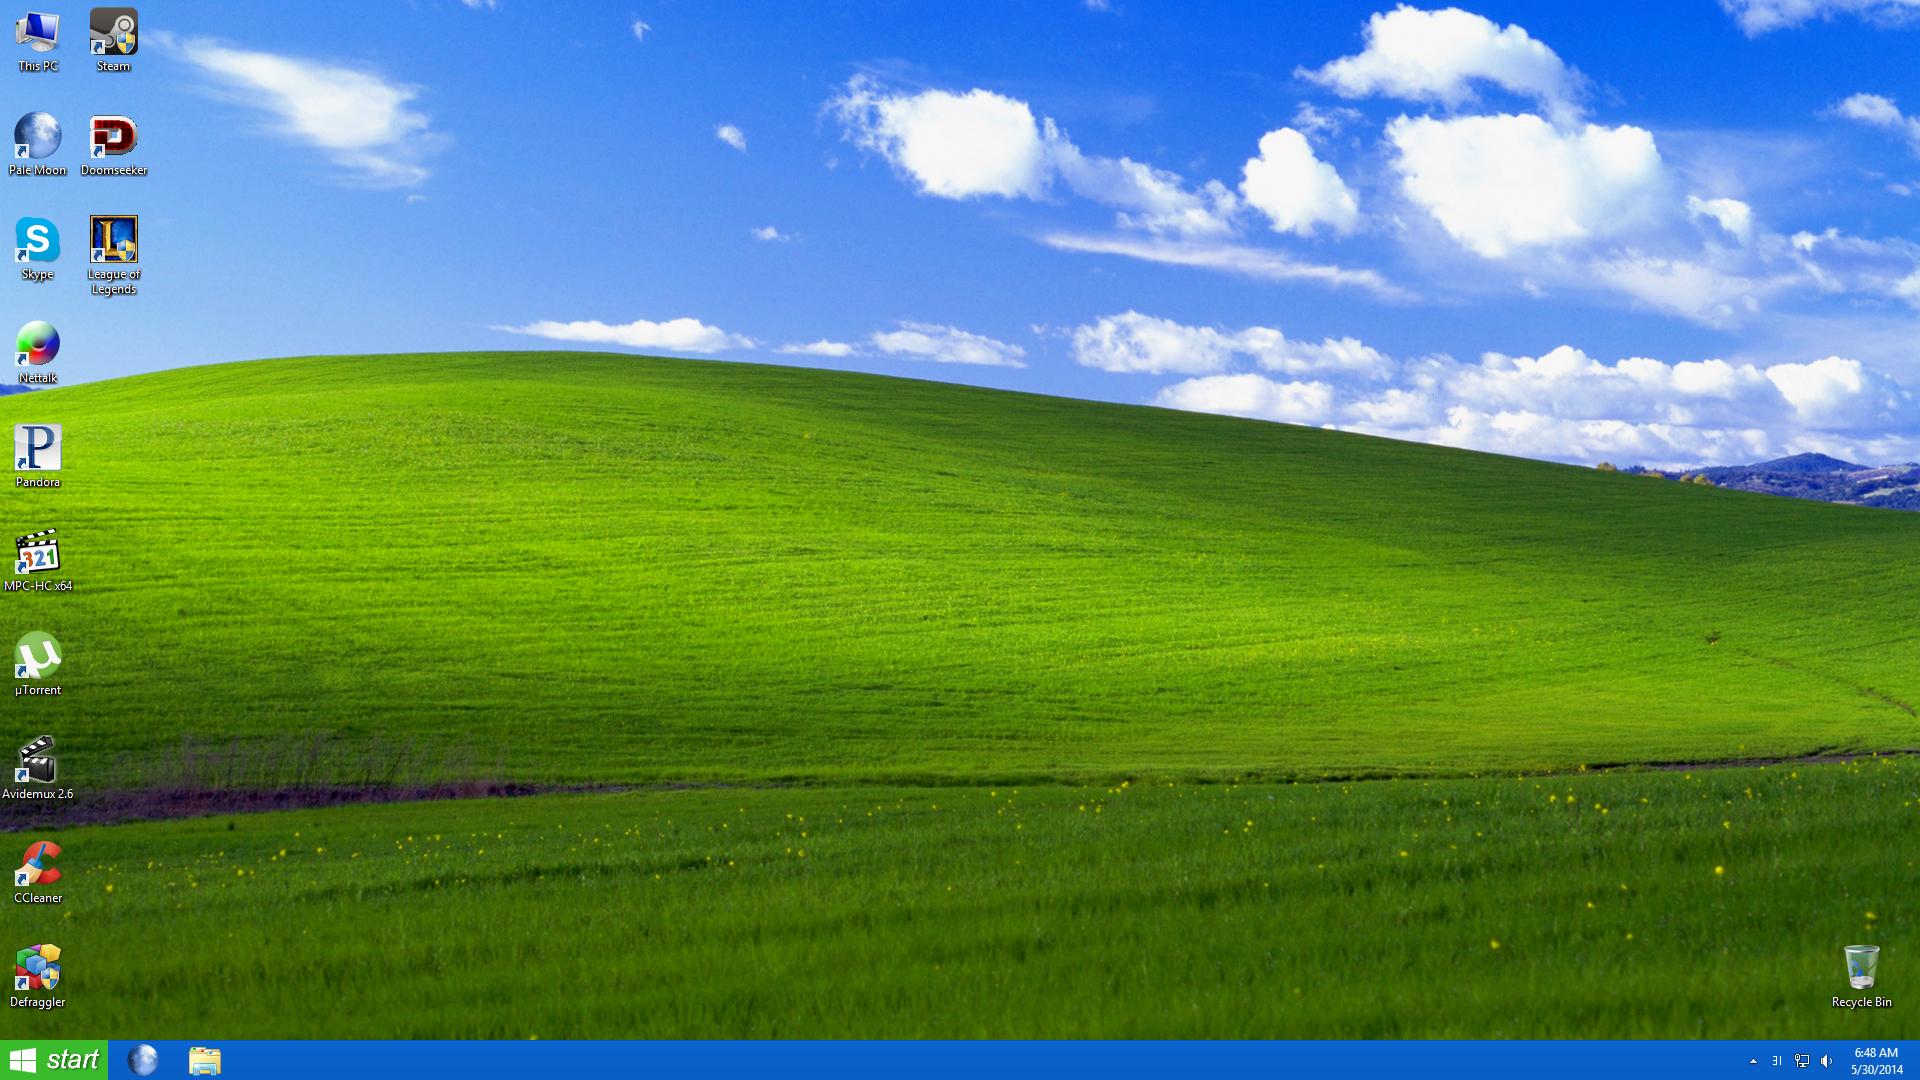 Pubg Wallpaper Trool: What Does YOUR Desktop Look Like?